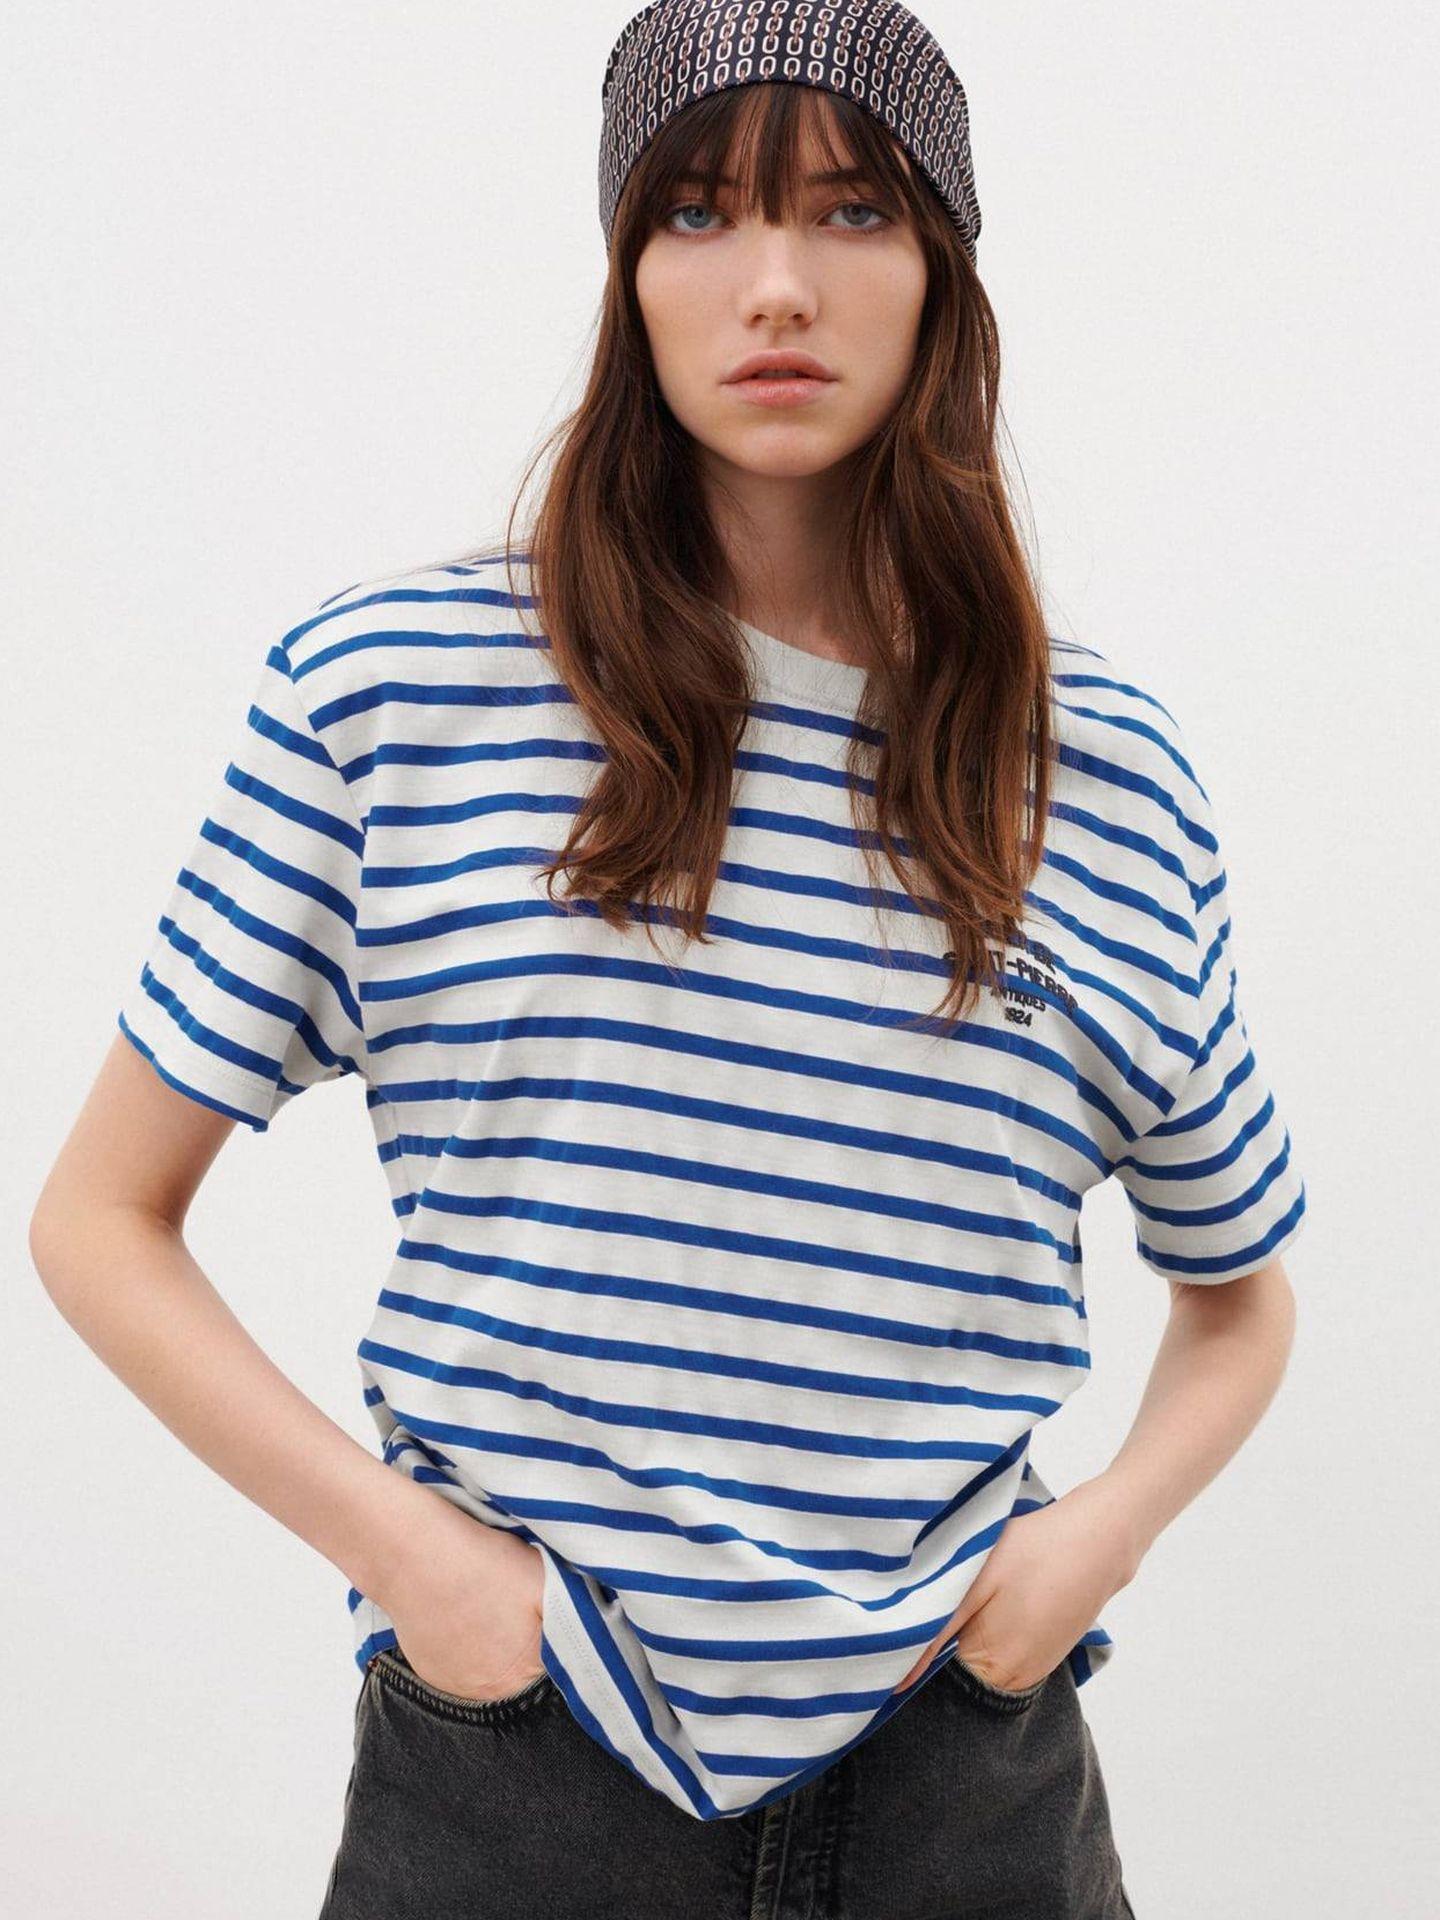 Camiseta de rayas de Zara. (Cortesía)